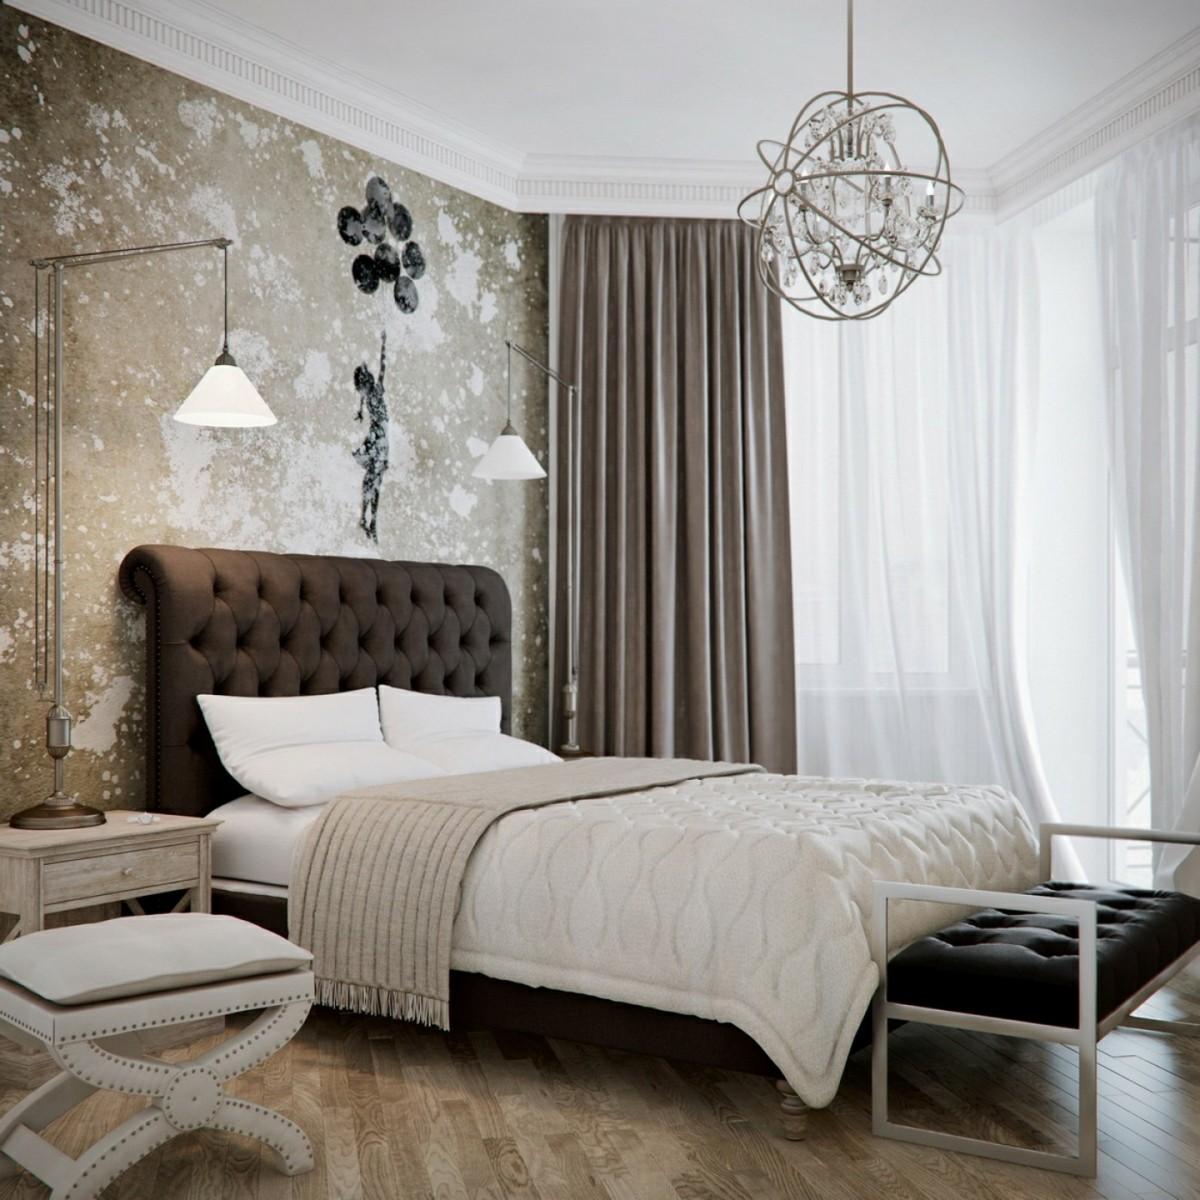 Supreme Master Bedroom Wall Decor Ideas Bedroom Wall Decor Ideas Decor